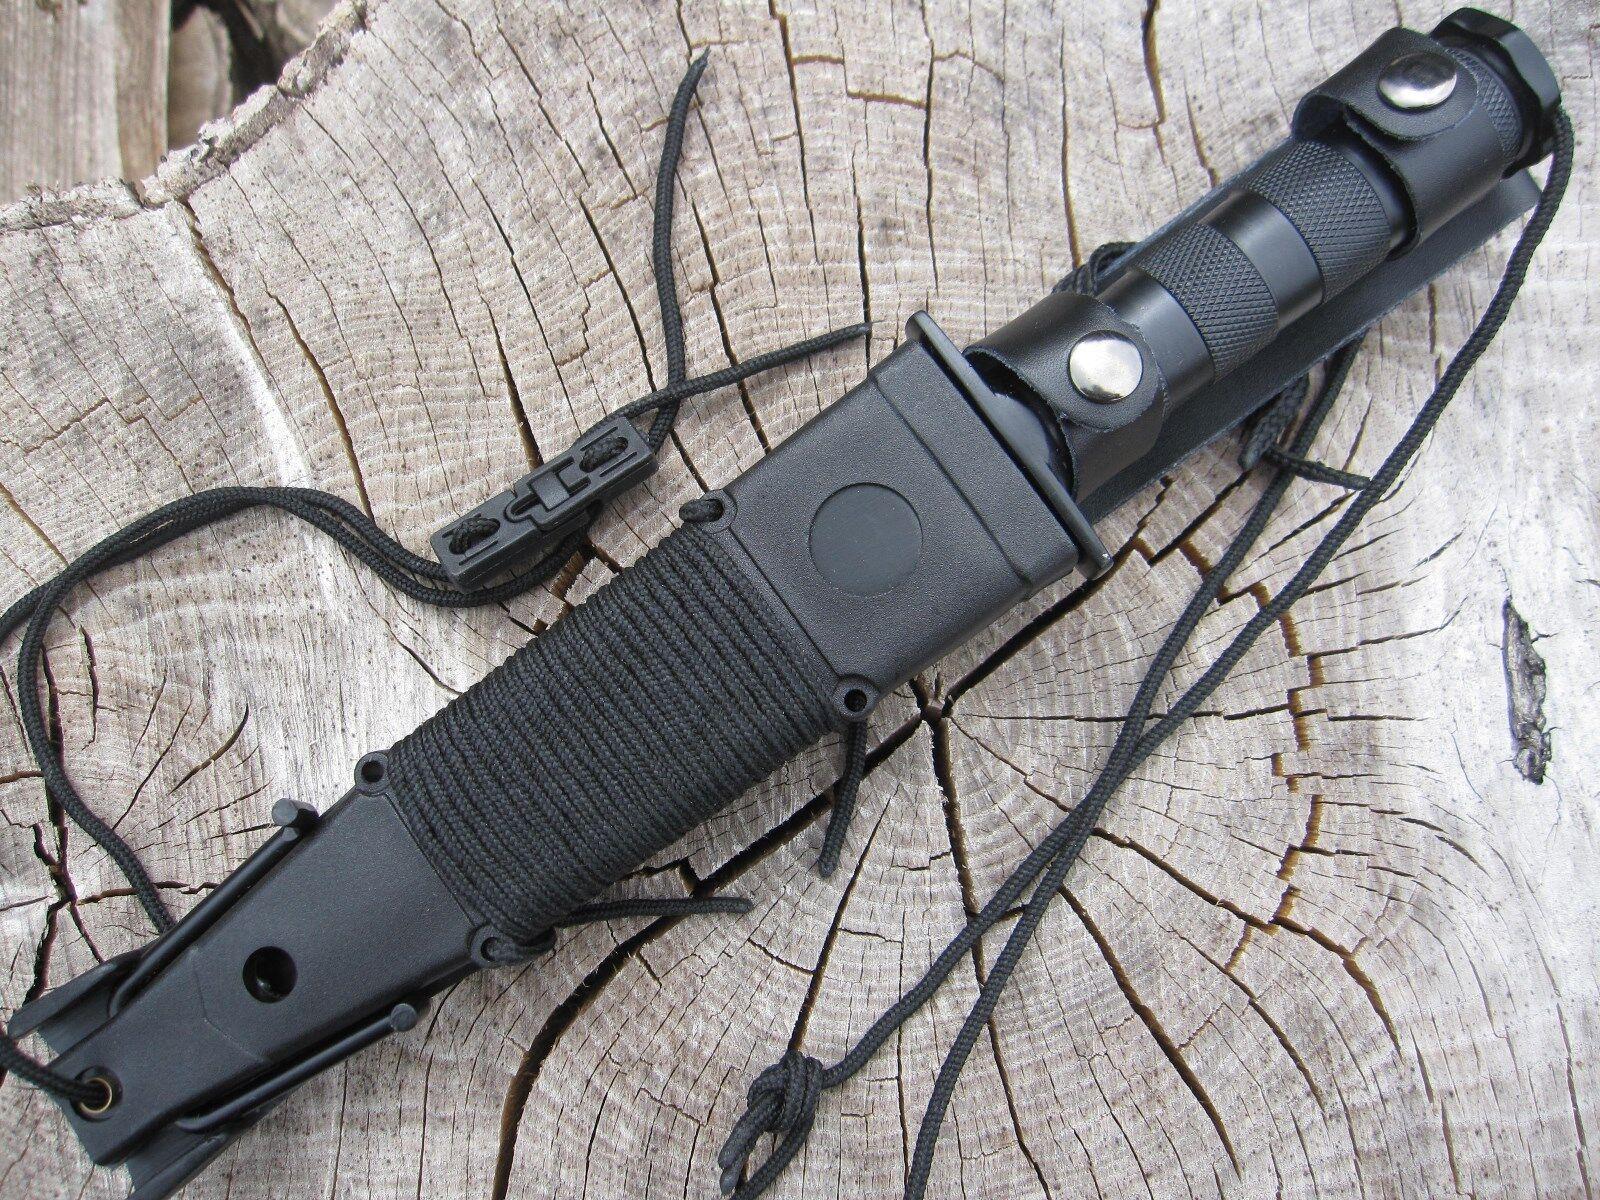 15teilig Outdoor Set Survival Gürtelmesser Jagd Messer Säge Kompass usw. Mi1